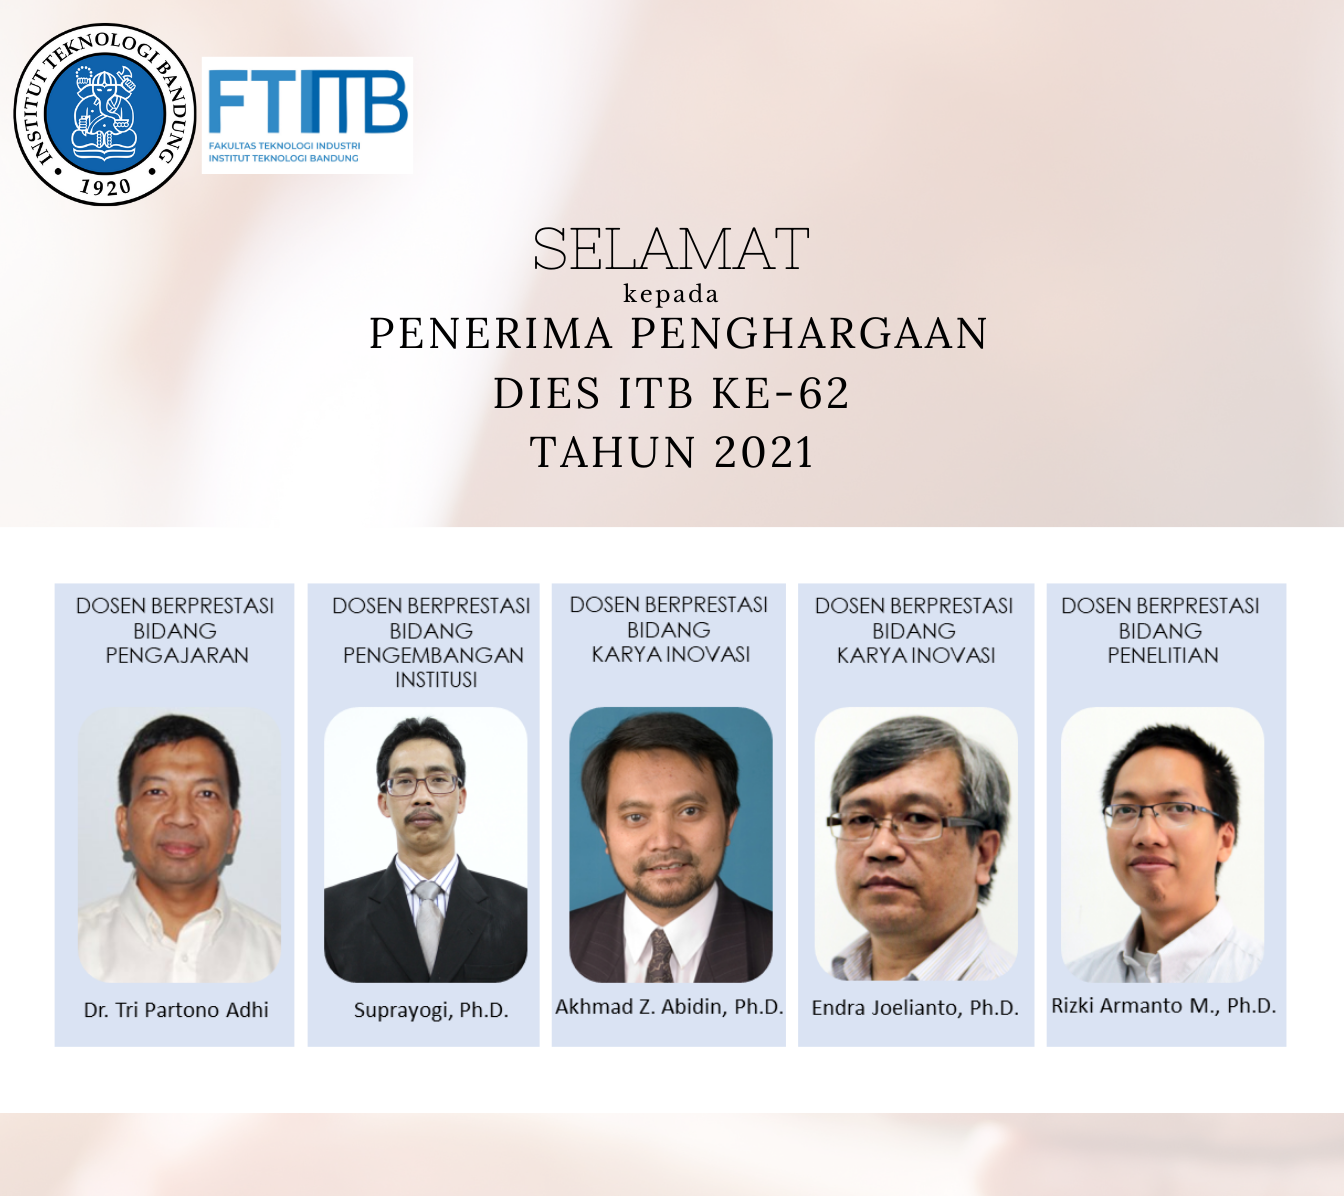 Penganugerahan Penghargaan Institut Teknologi Bandung dalam rangka Dies ITB ke-62 Tahun 2021